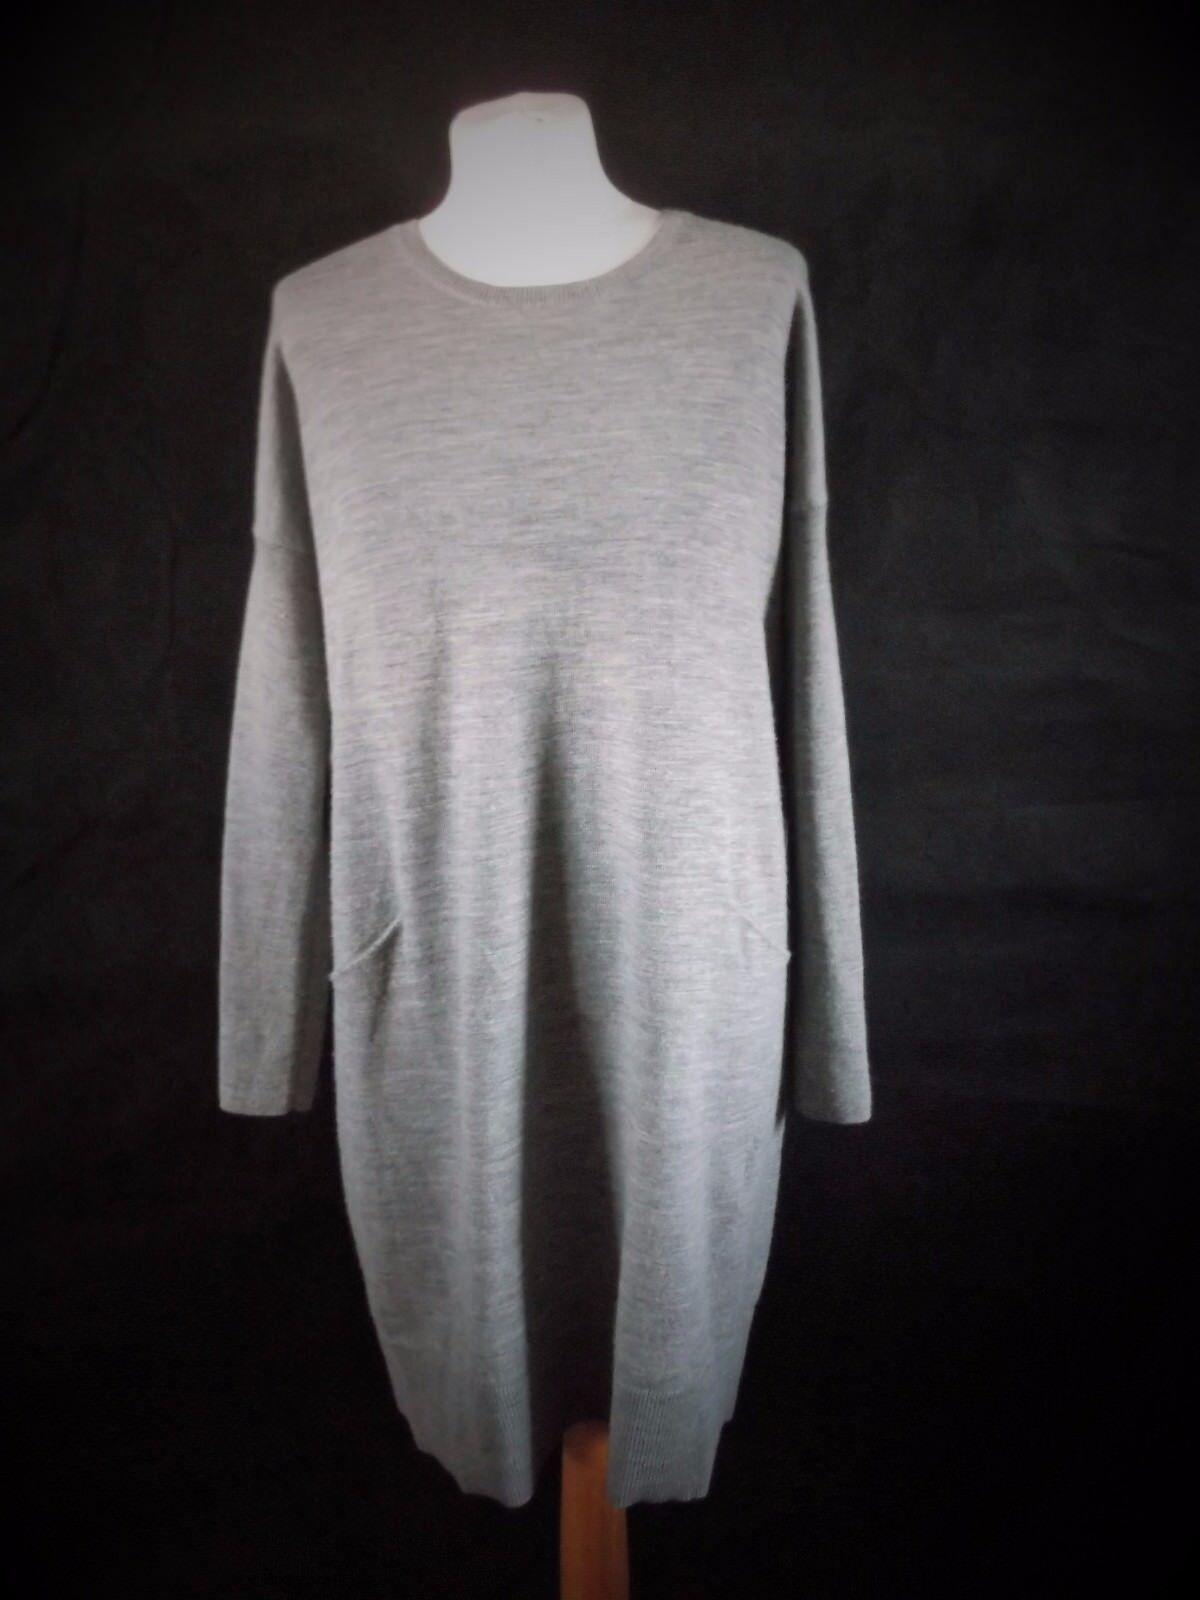 HOBBS jumper dress dress dress in finest wool grey - immaculate oversized slouchy 10 5ca9cc